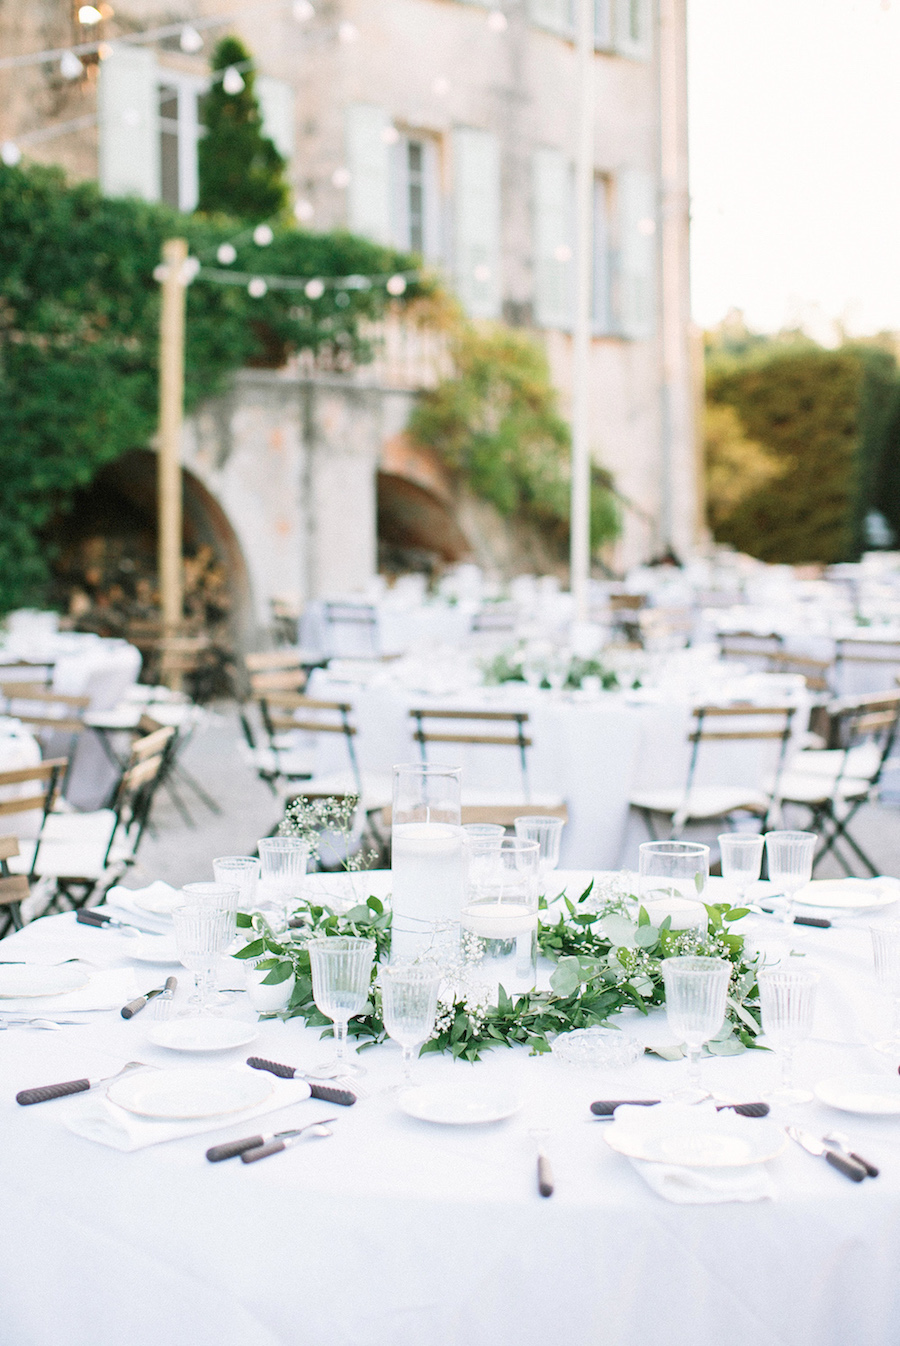 saya-photography-wedding-french-riviera-rustic-antibes-la-bastide-du-roy-94.jpg